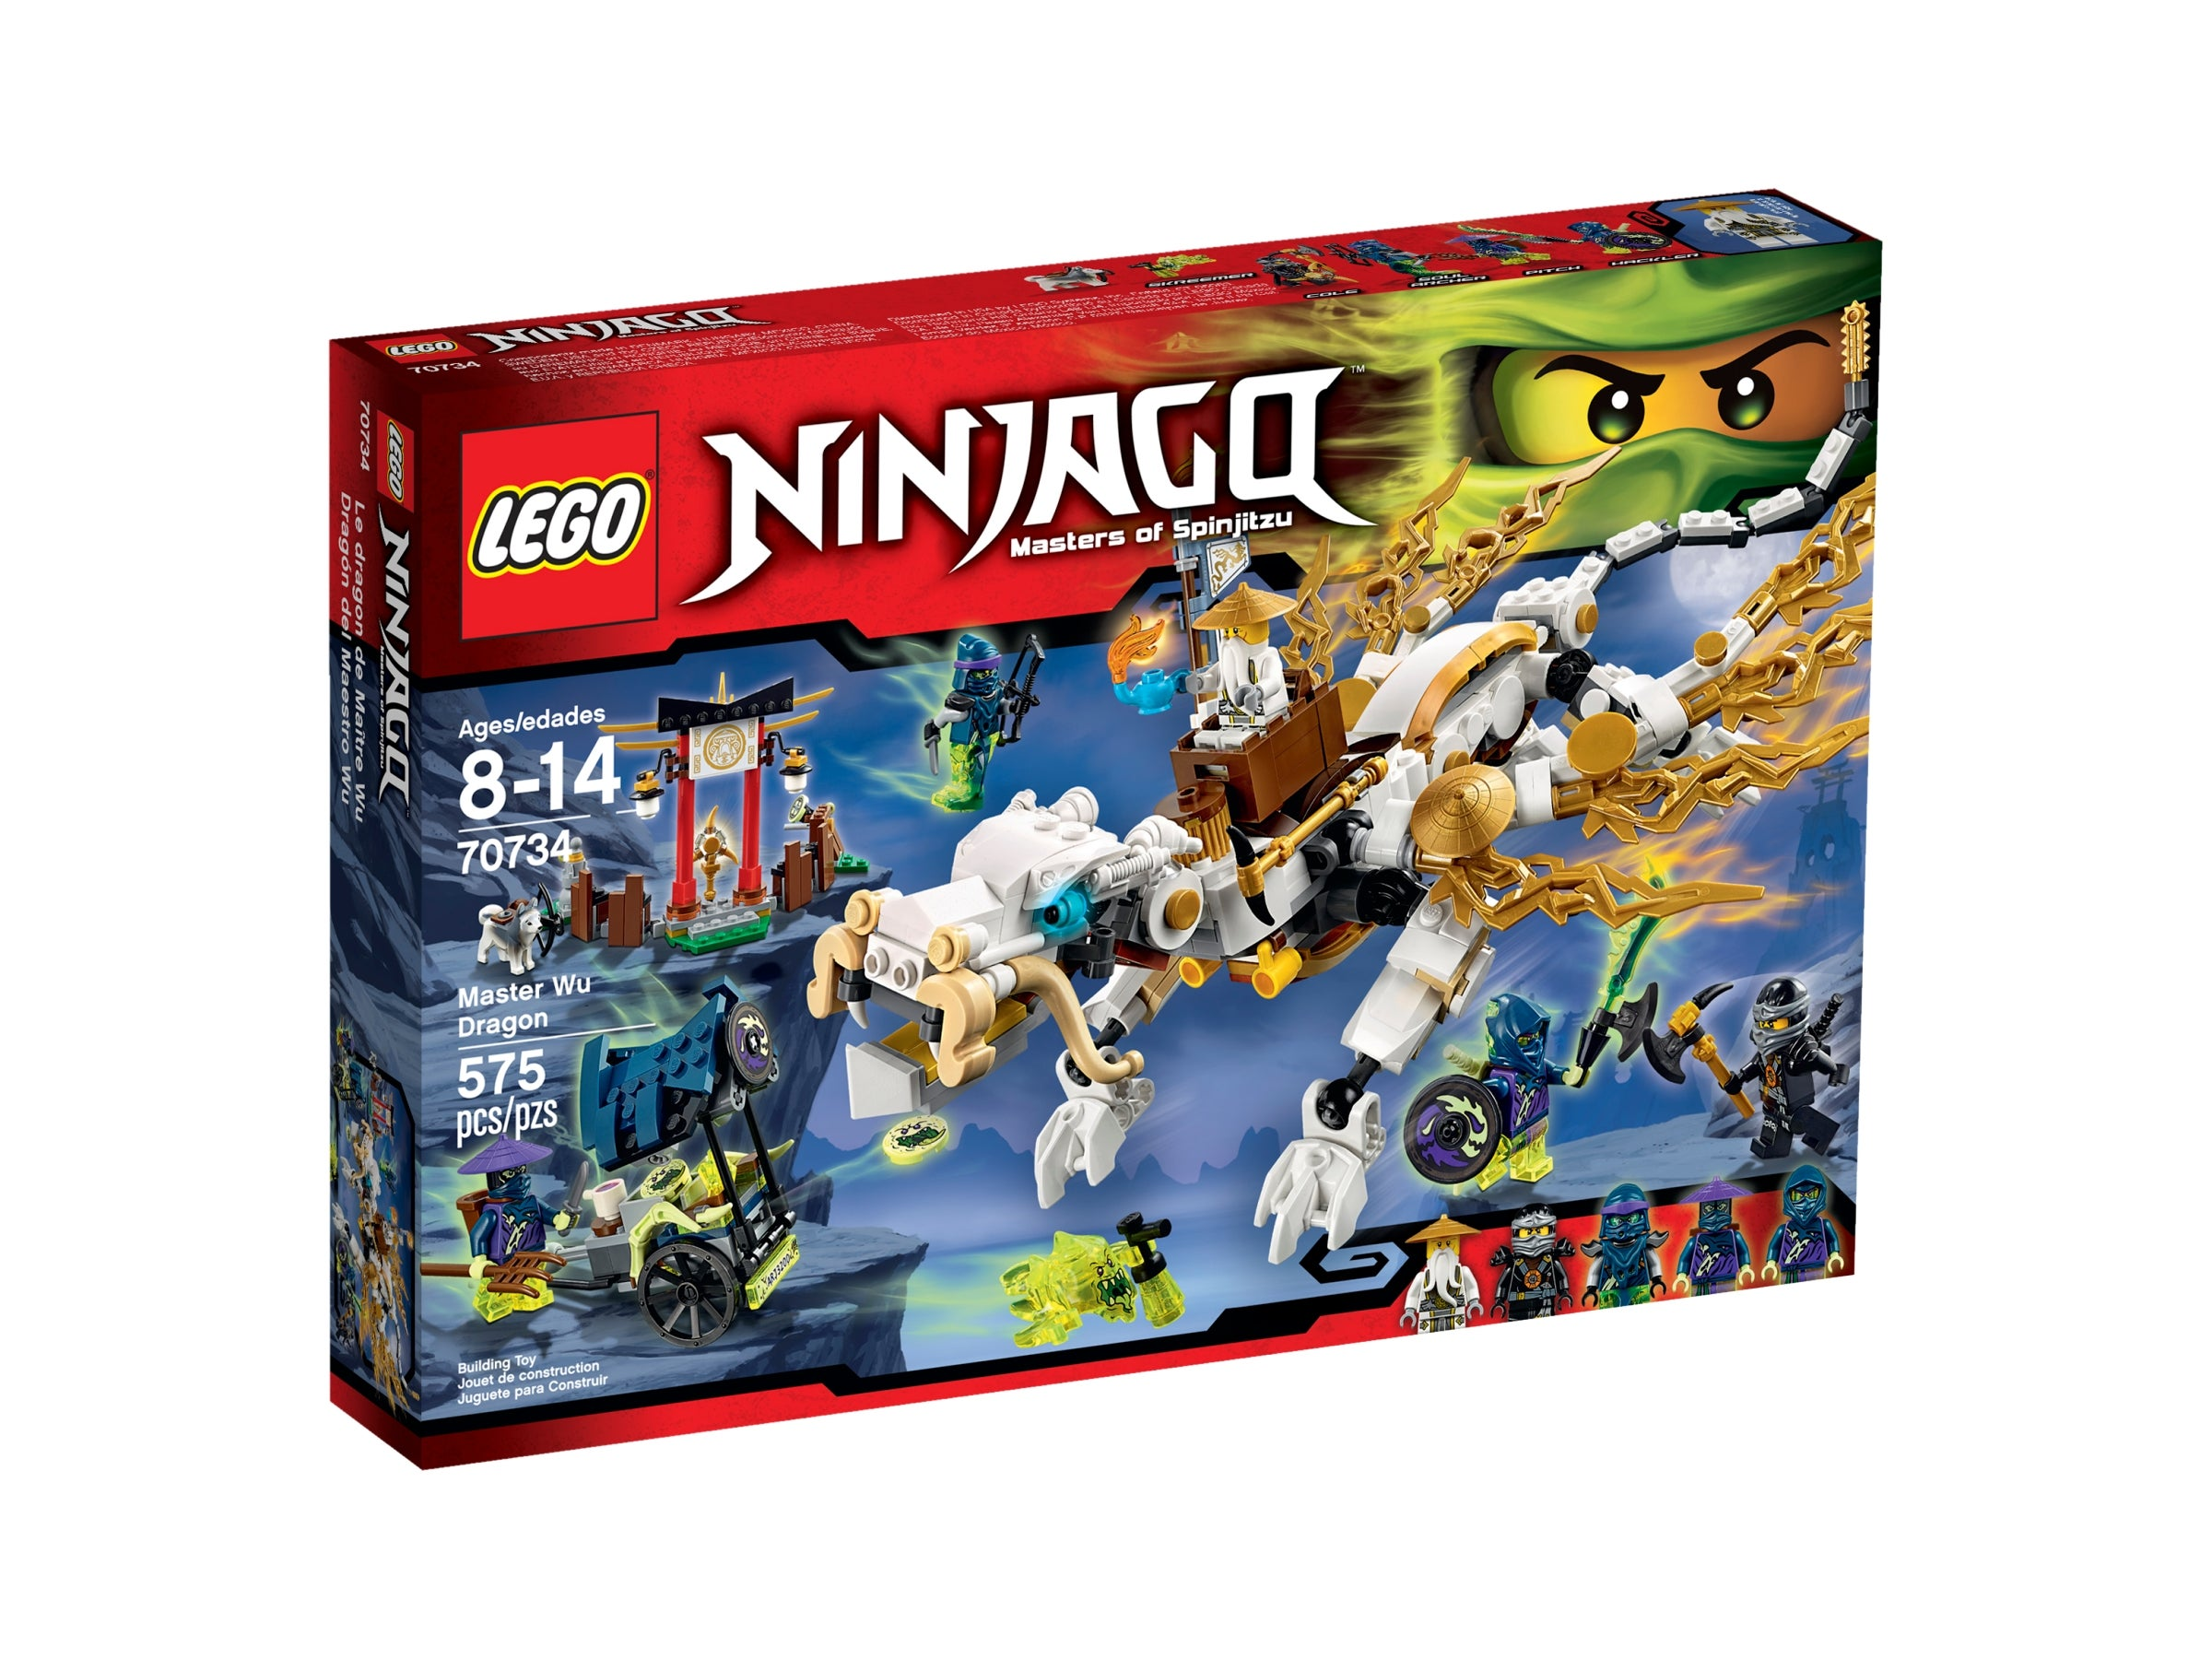 Lego polybag ninjago shield round shield round with dragon head new